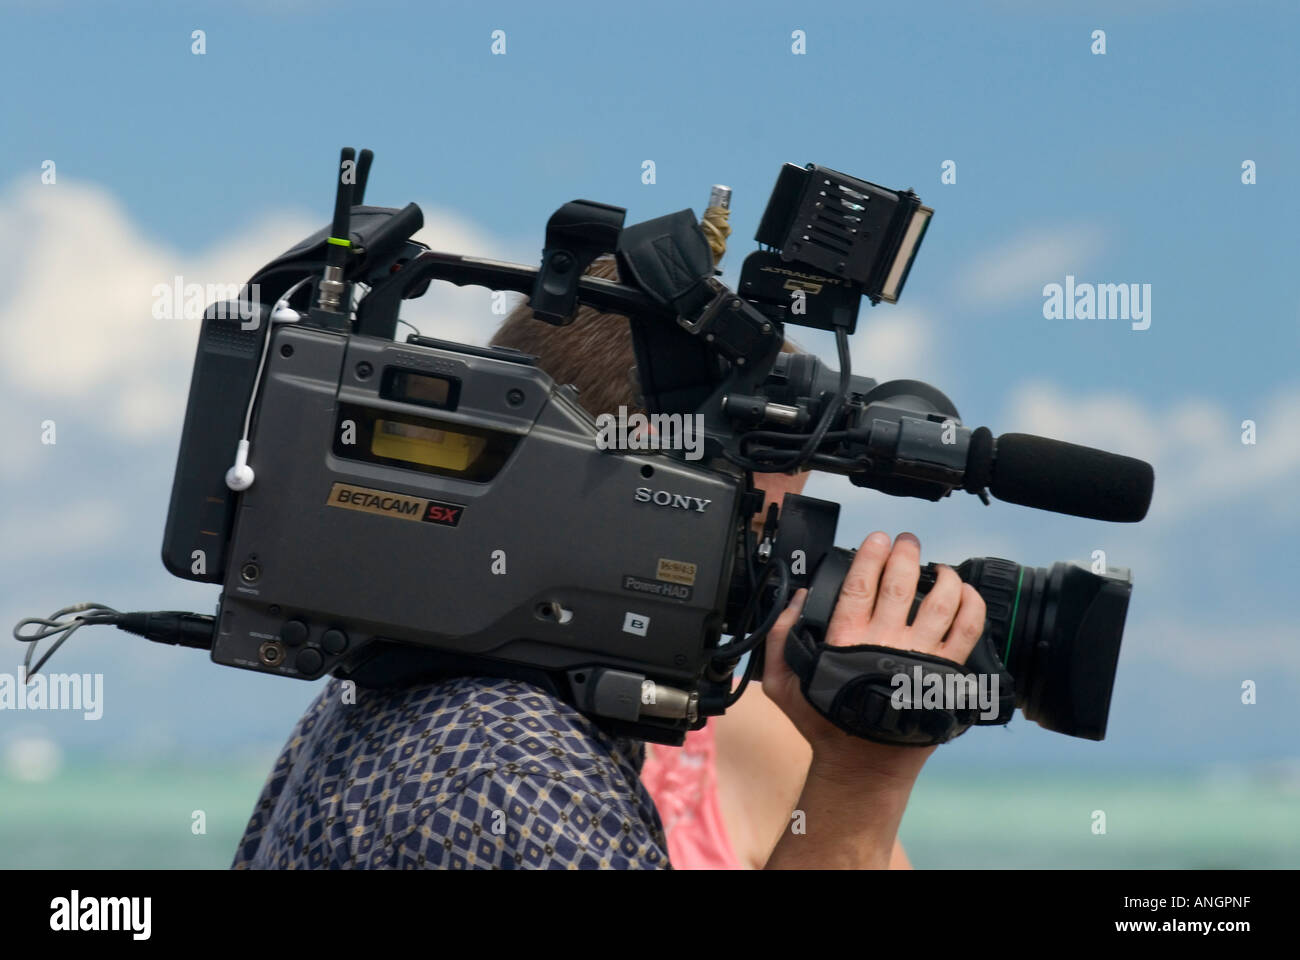 Videógrafo y cámara Imagen De Stock